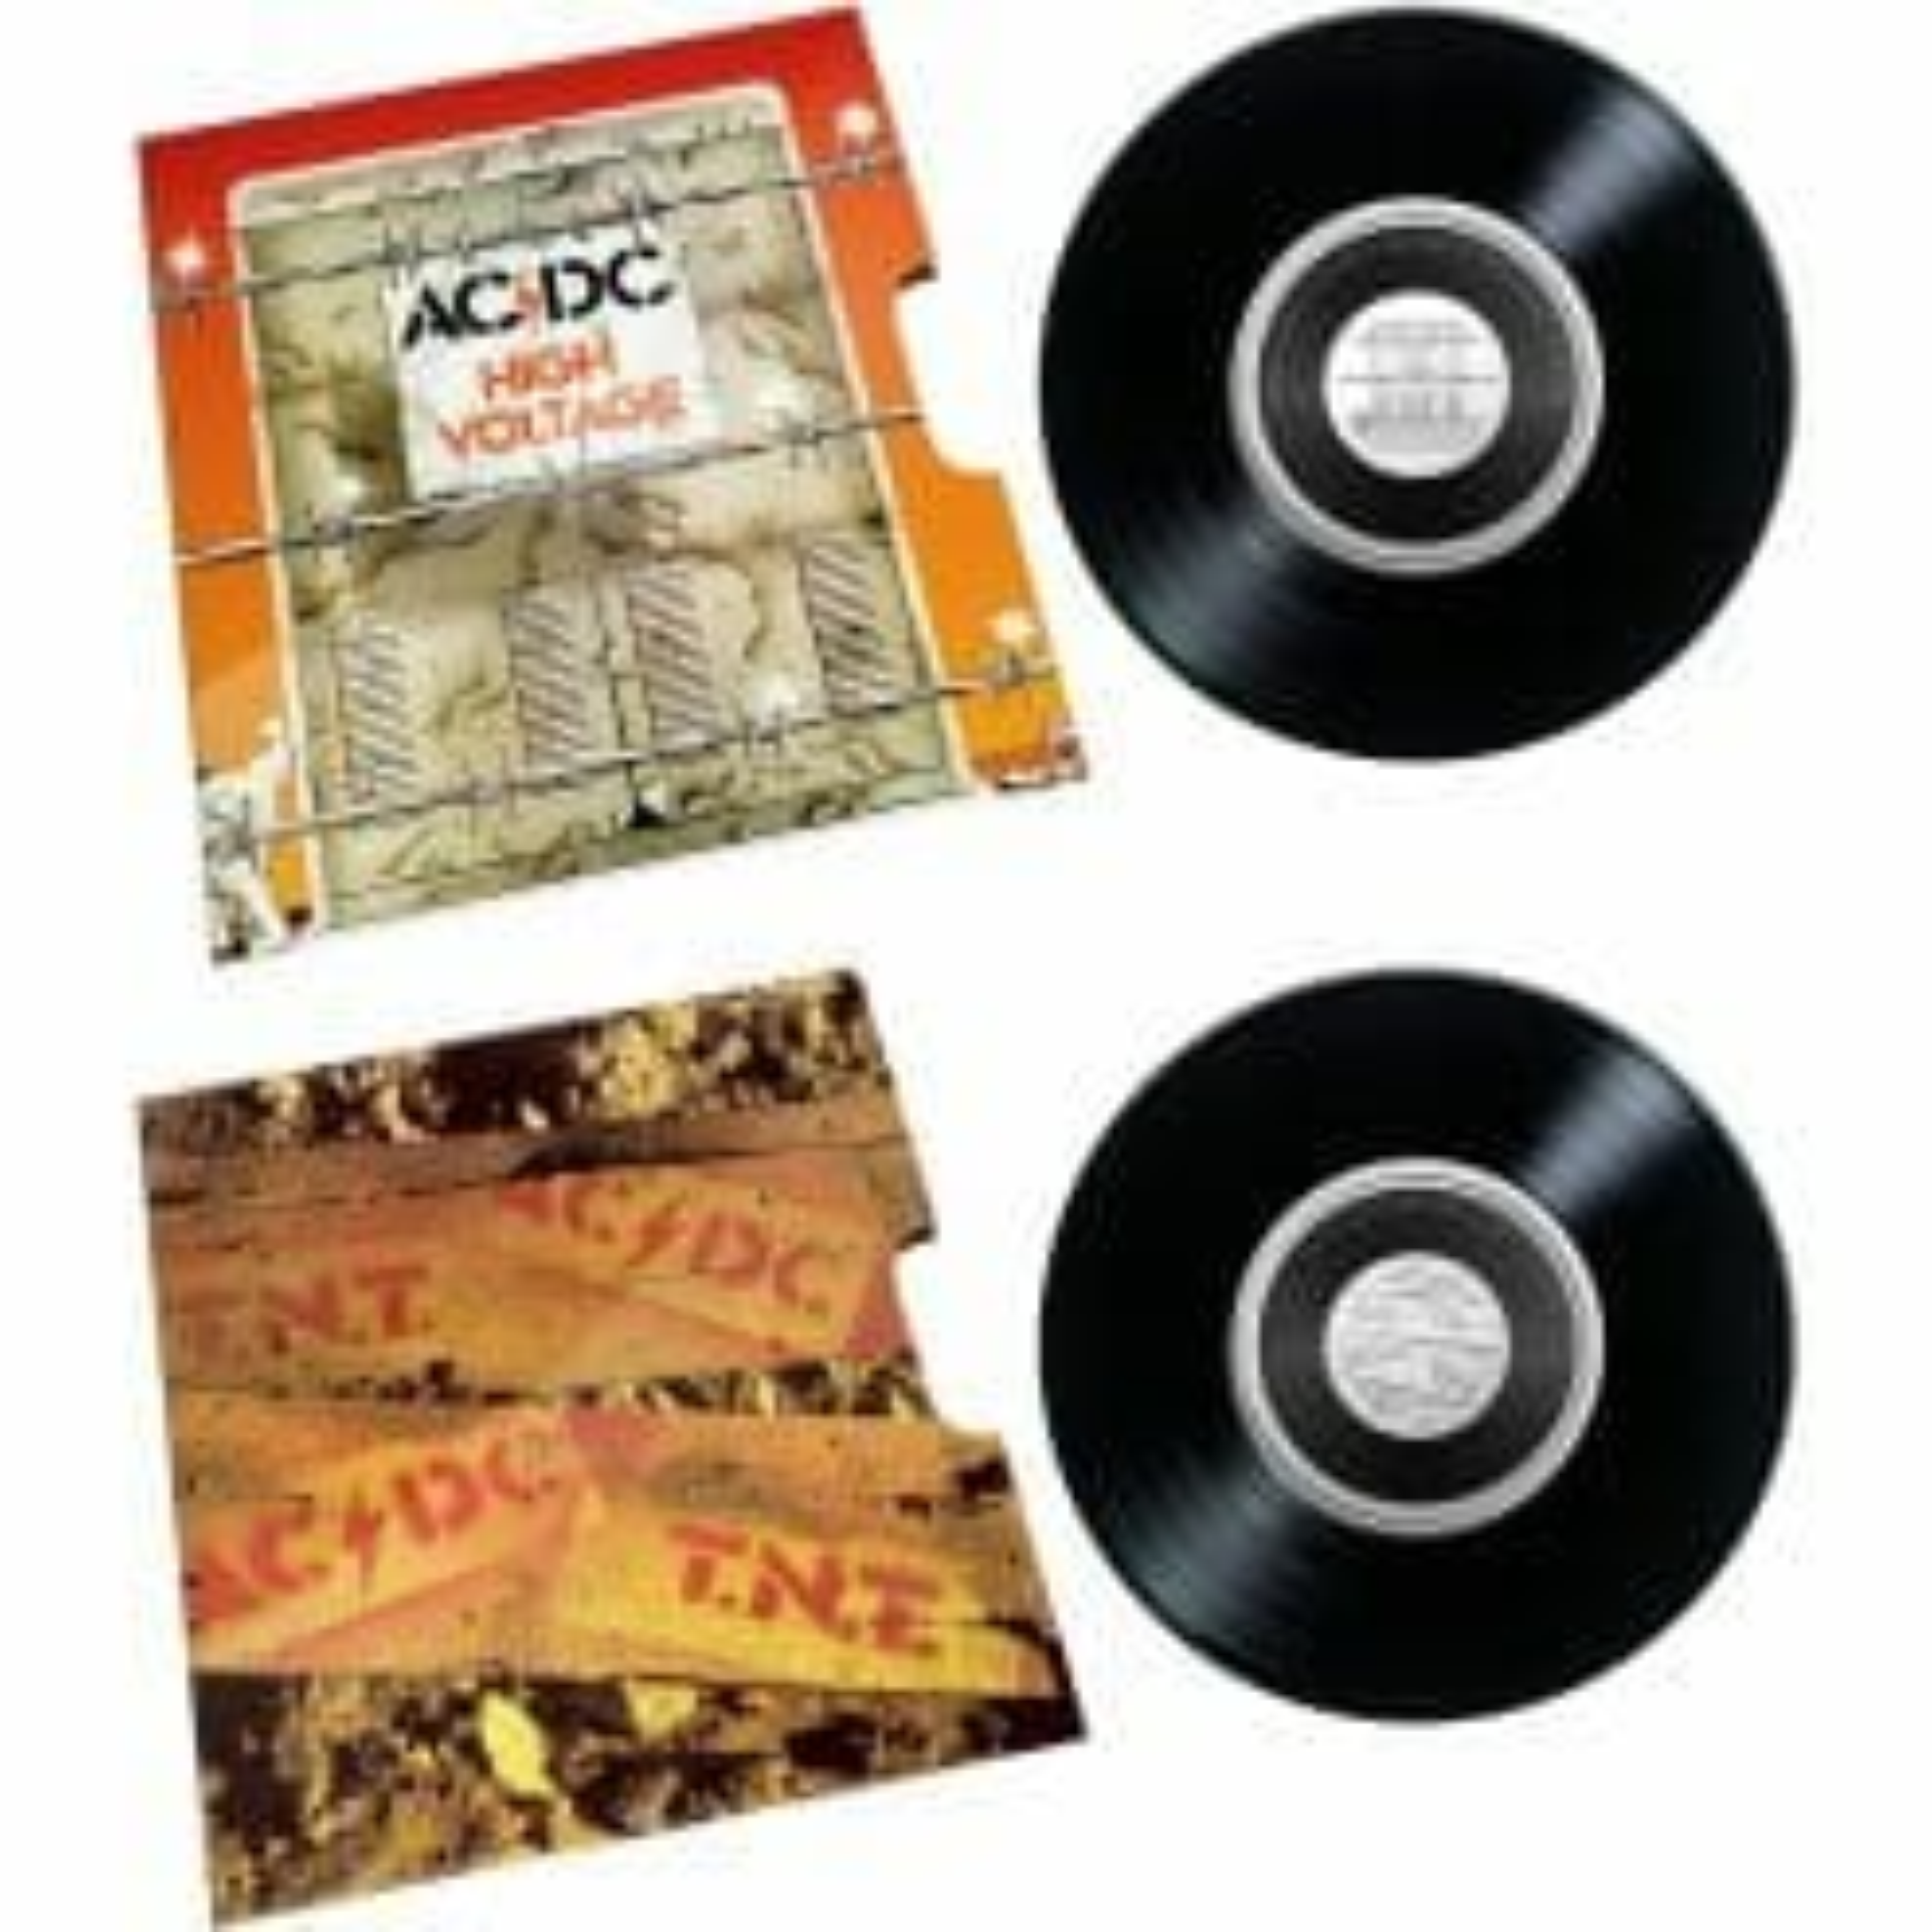 2020/2021 - AC/DC Seven Coin Collection - 20c Coloured CuNi Unc Coins 10